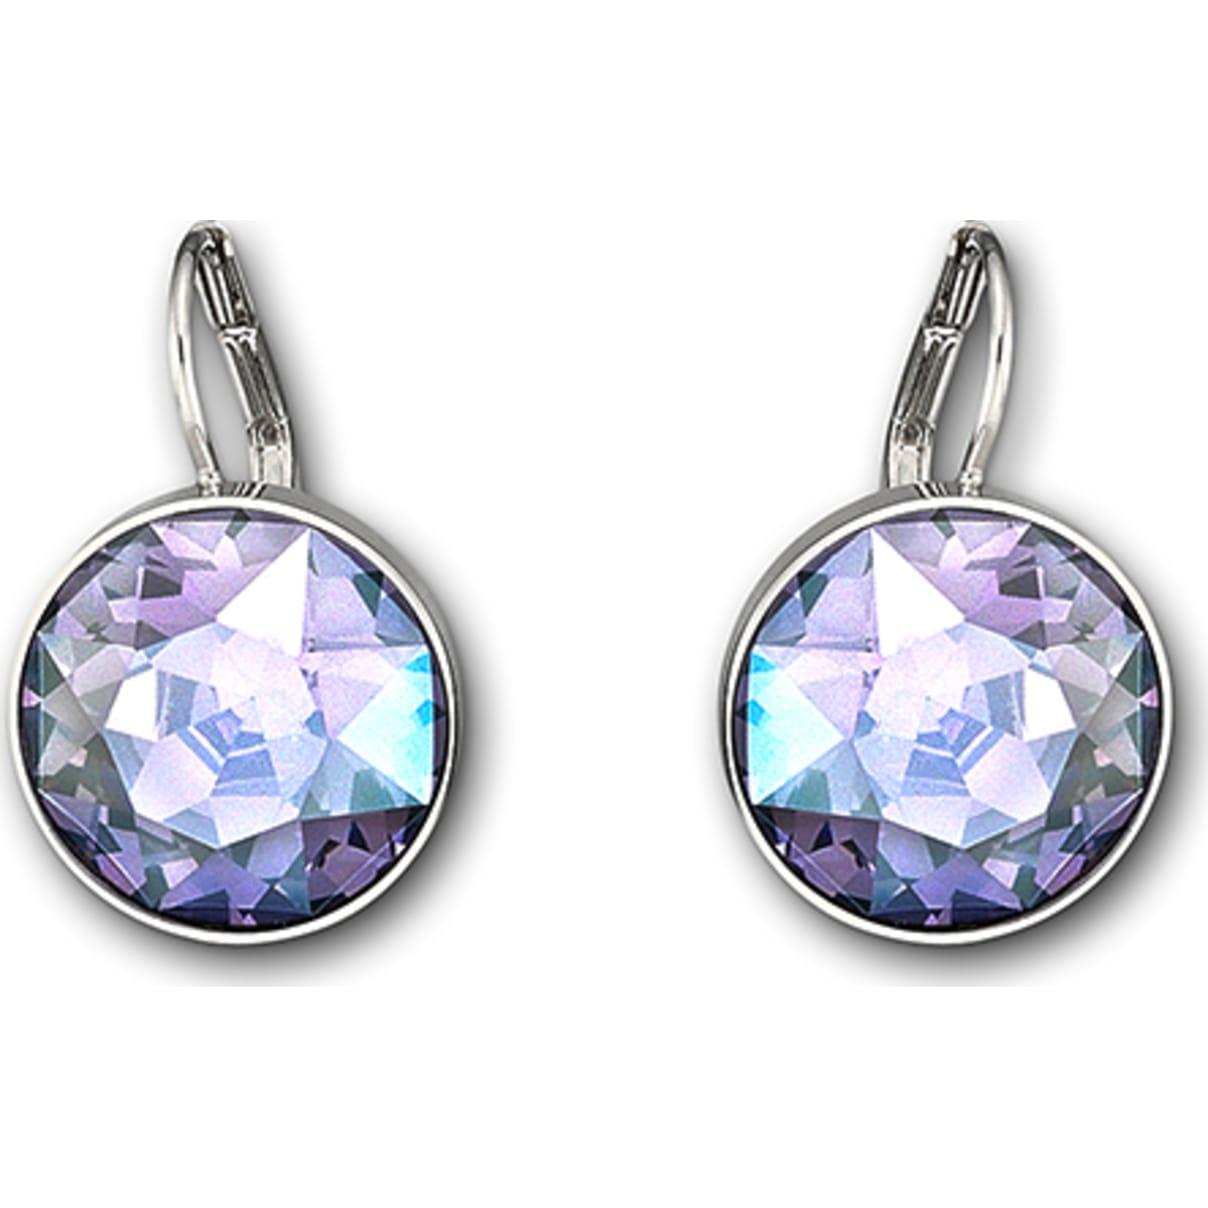 Swarovski Bella Pierced Earrings, Purple, Rhodium plated